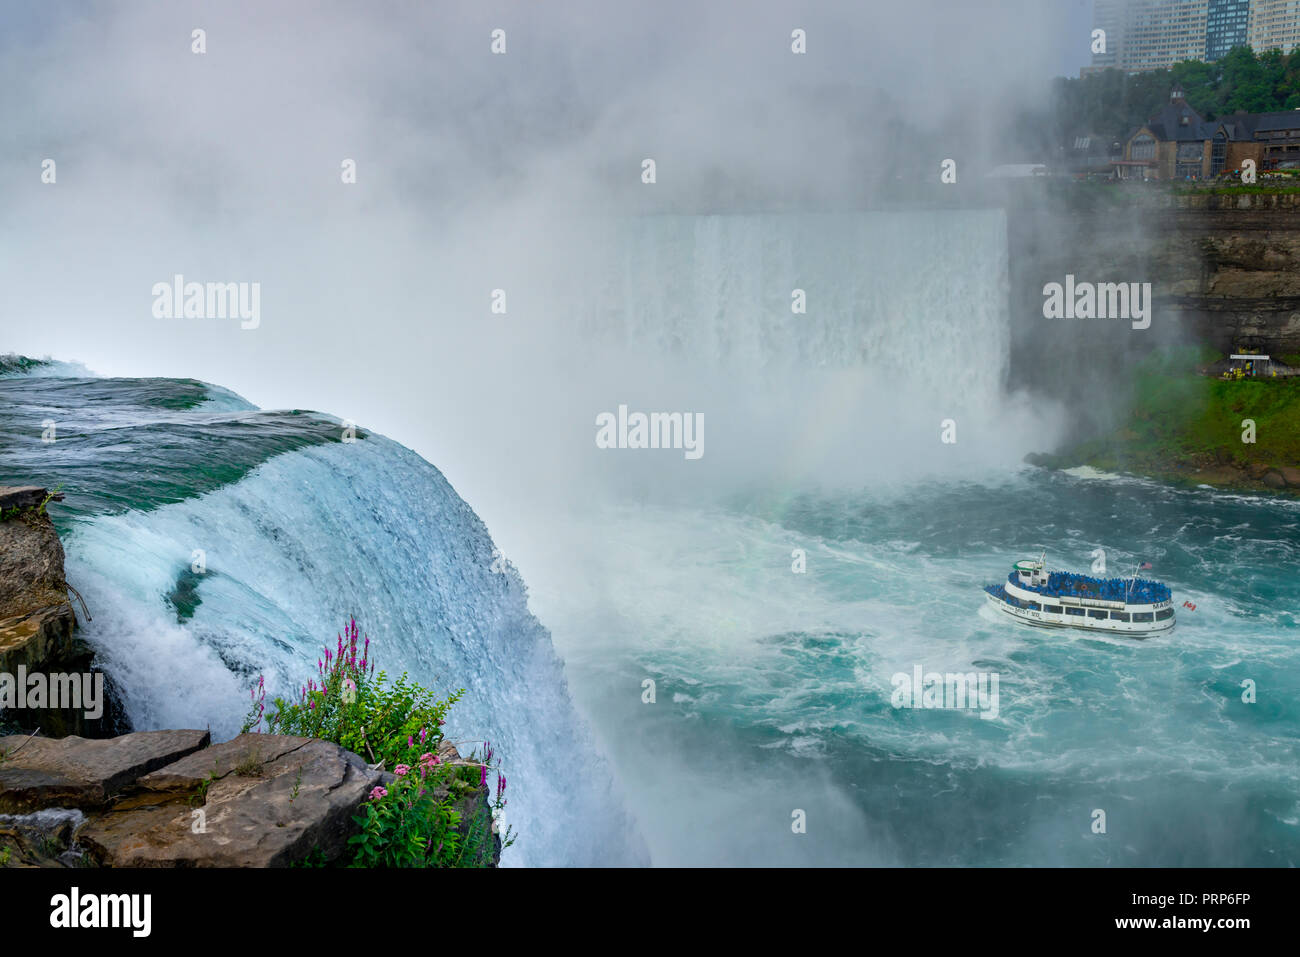 Mädchen des Nebels Ausflugsboot, Niagara Falls, Kanada Stockbild